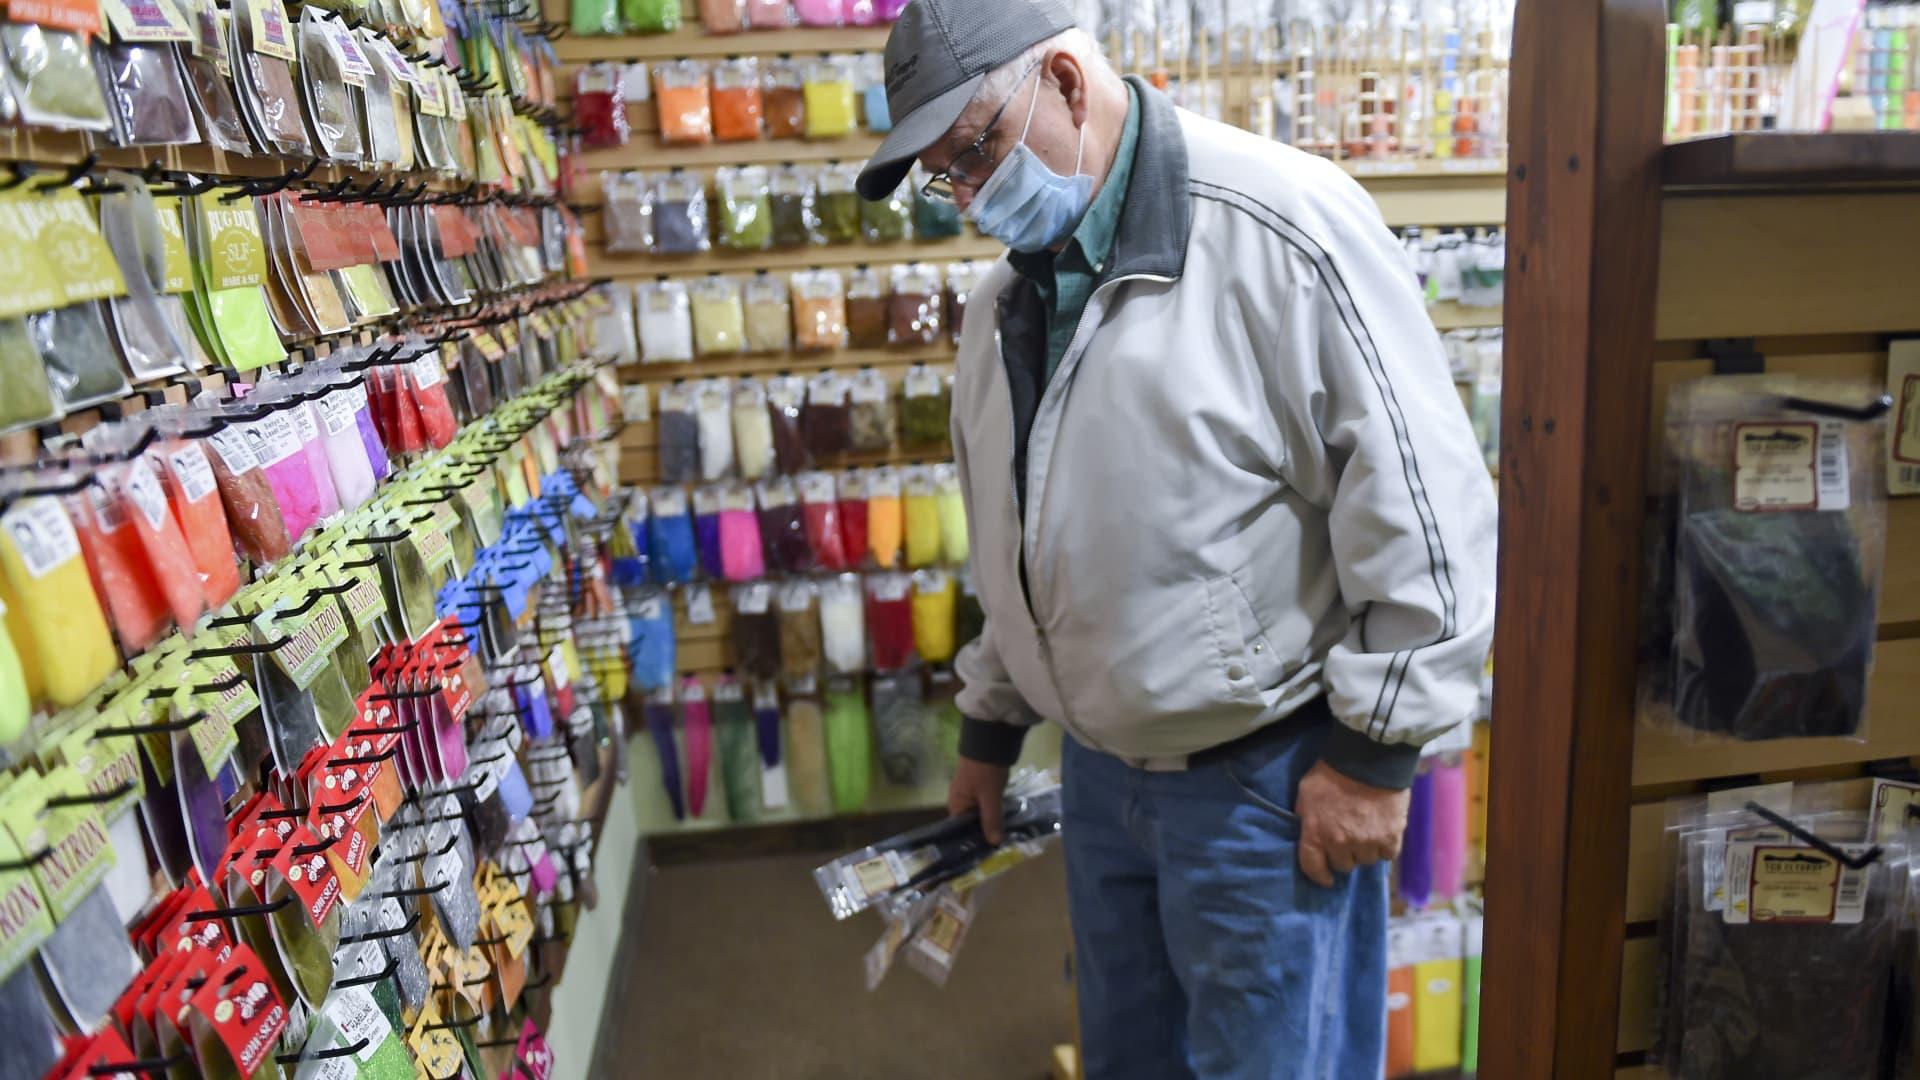 A shopper in West Lawn, PA, February 19, 2021.